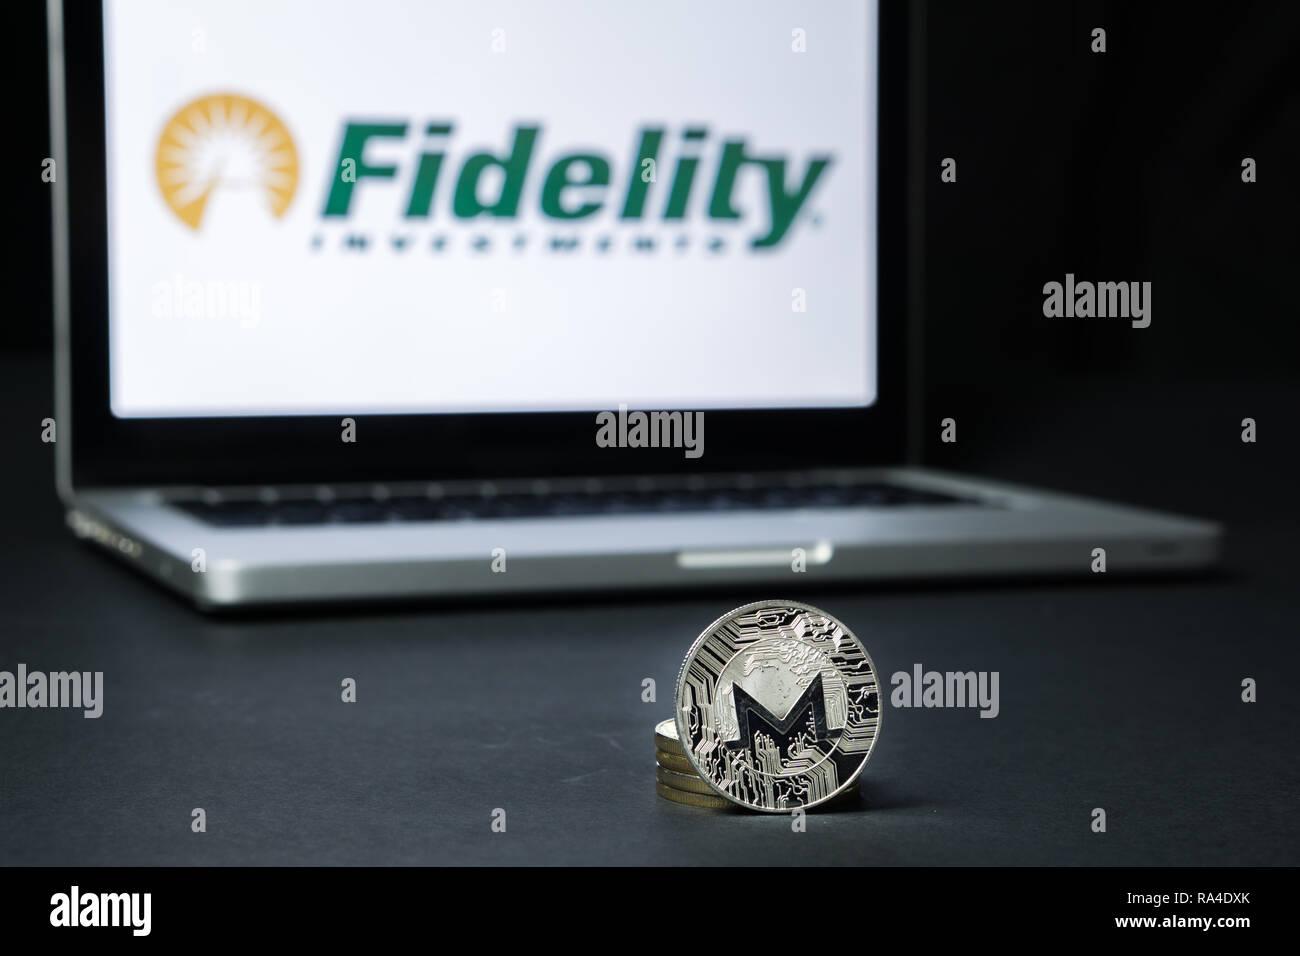 Monero coin with the Fidelity logo on a laptop screen, Slovenia - December 23th, 2018 Stock Photo